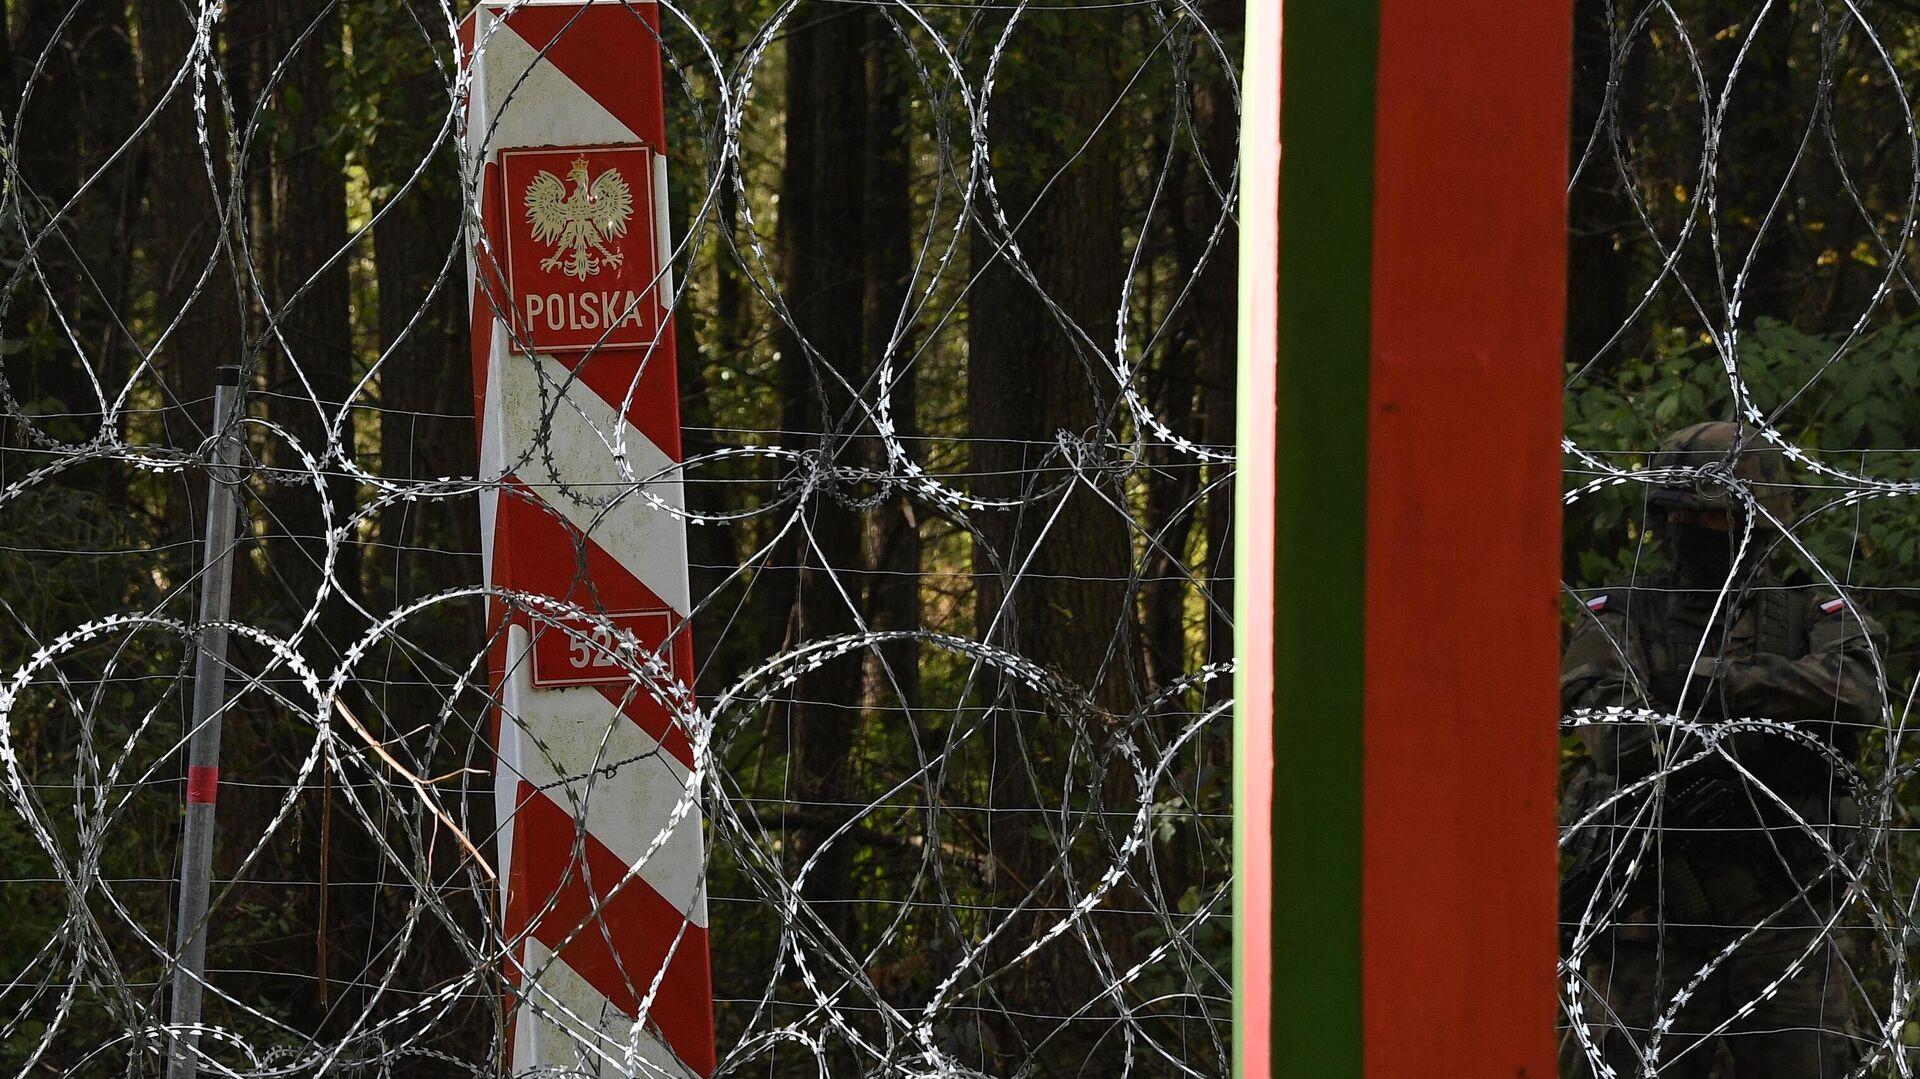 Tα σύνορα Πολωνίας - Λευκορωσίας - Sputnik Ελλάδα, 1920, 08.10.2021